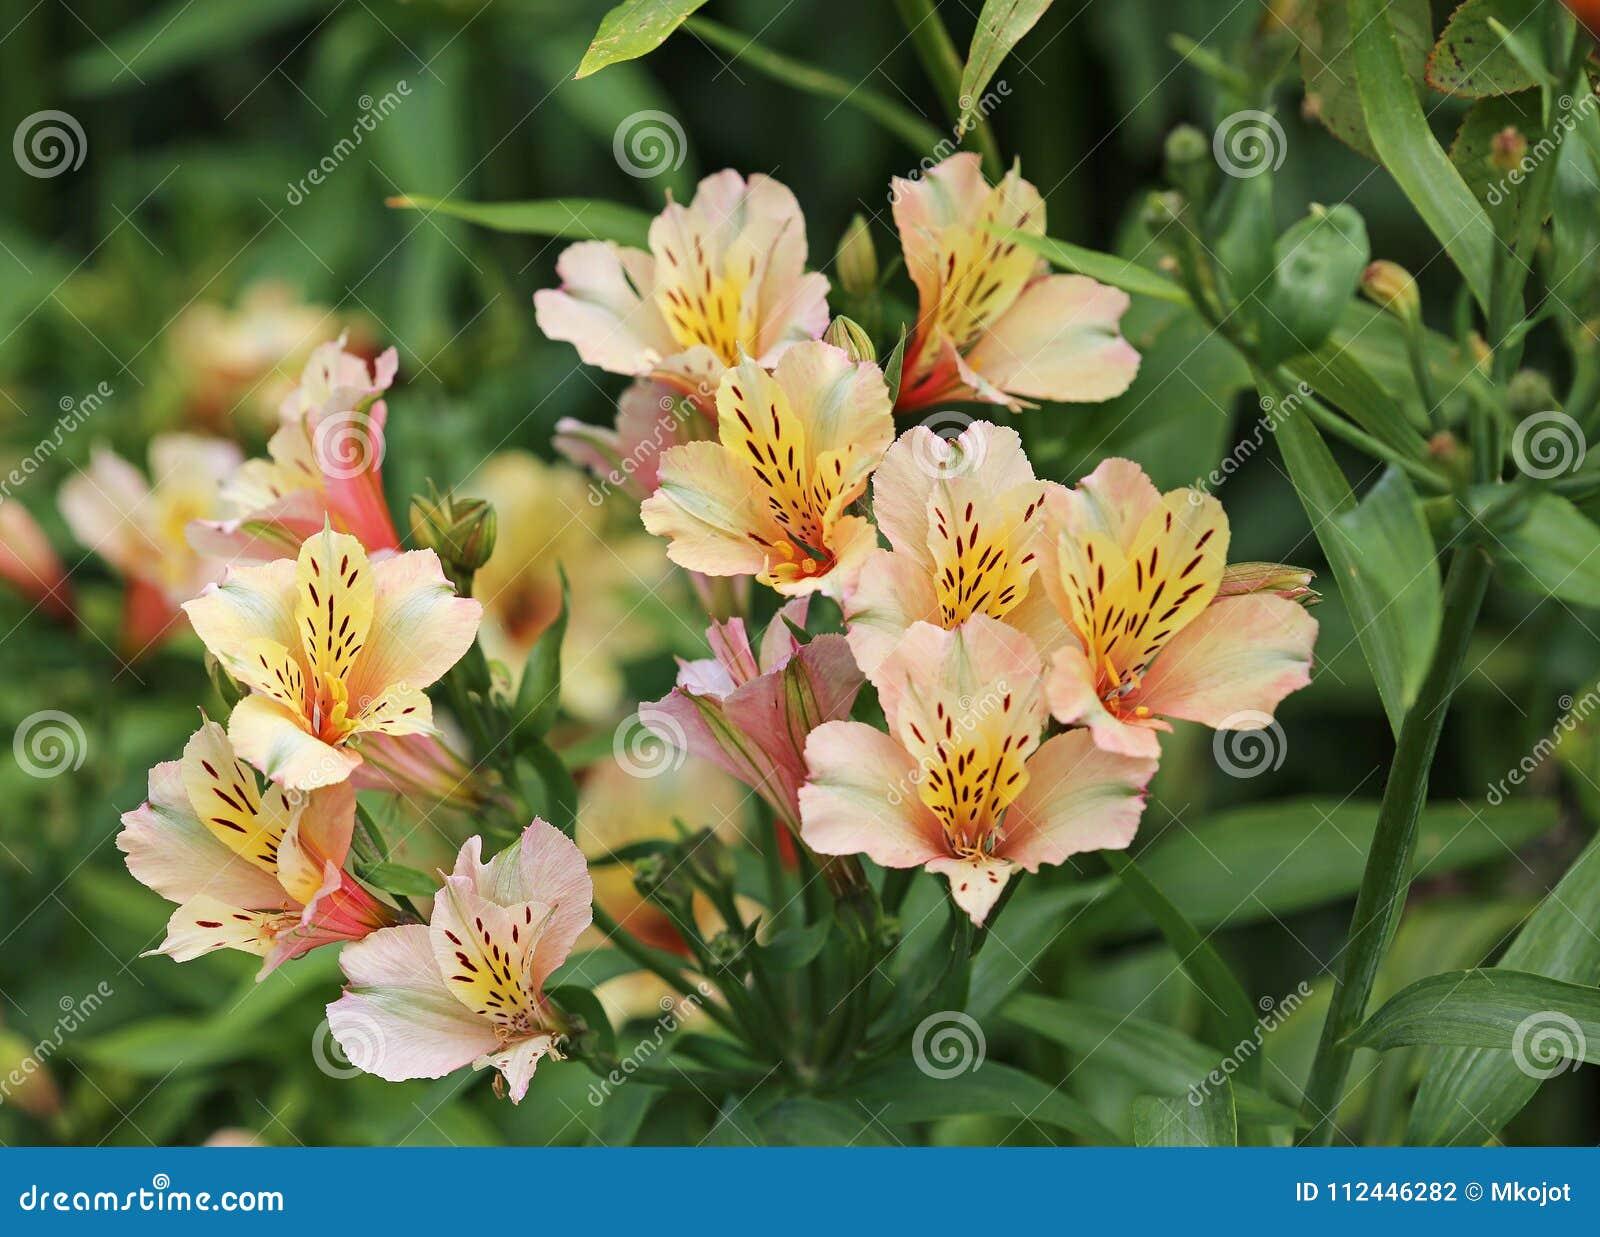 Alstroemeria flower stock photo image of alstroemeria 112446282 alstroemeria flower izmirmasajfo Gallery